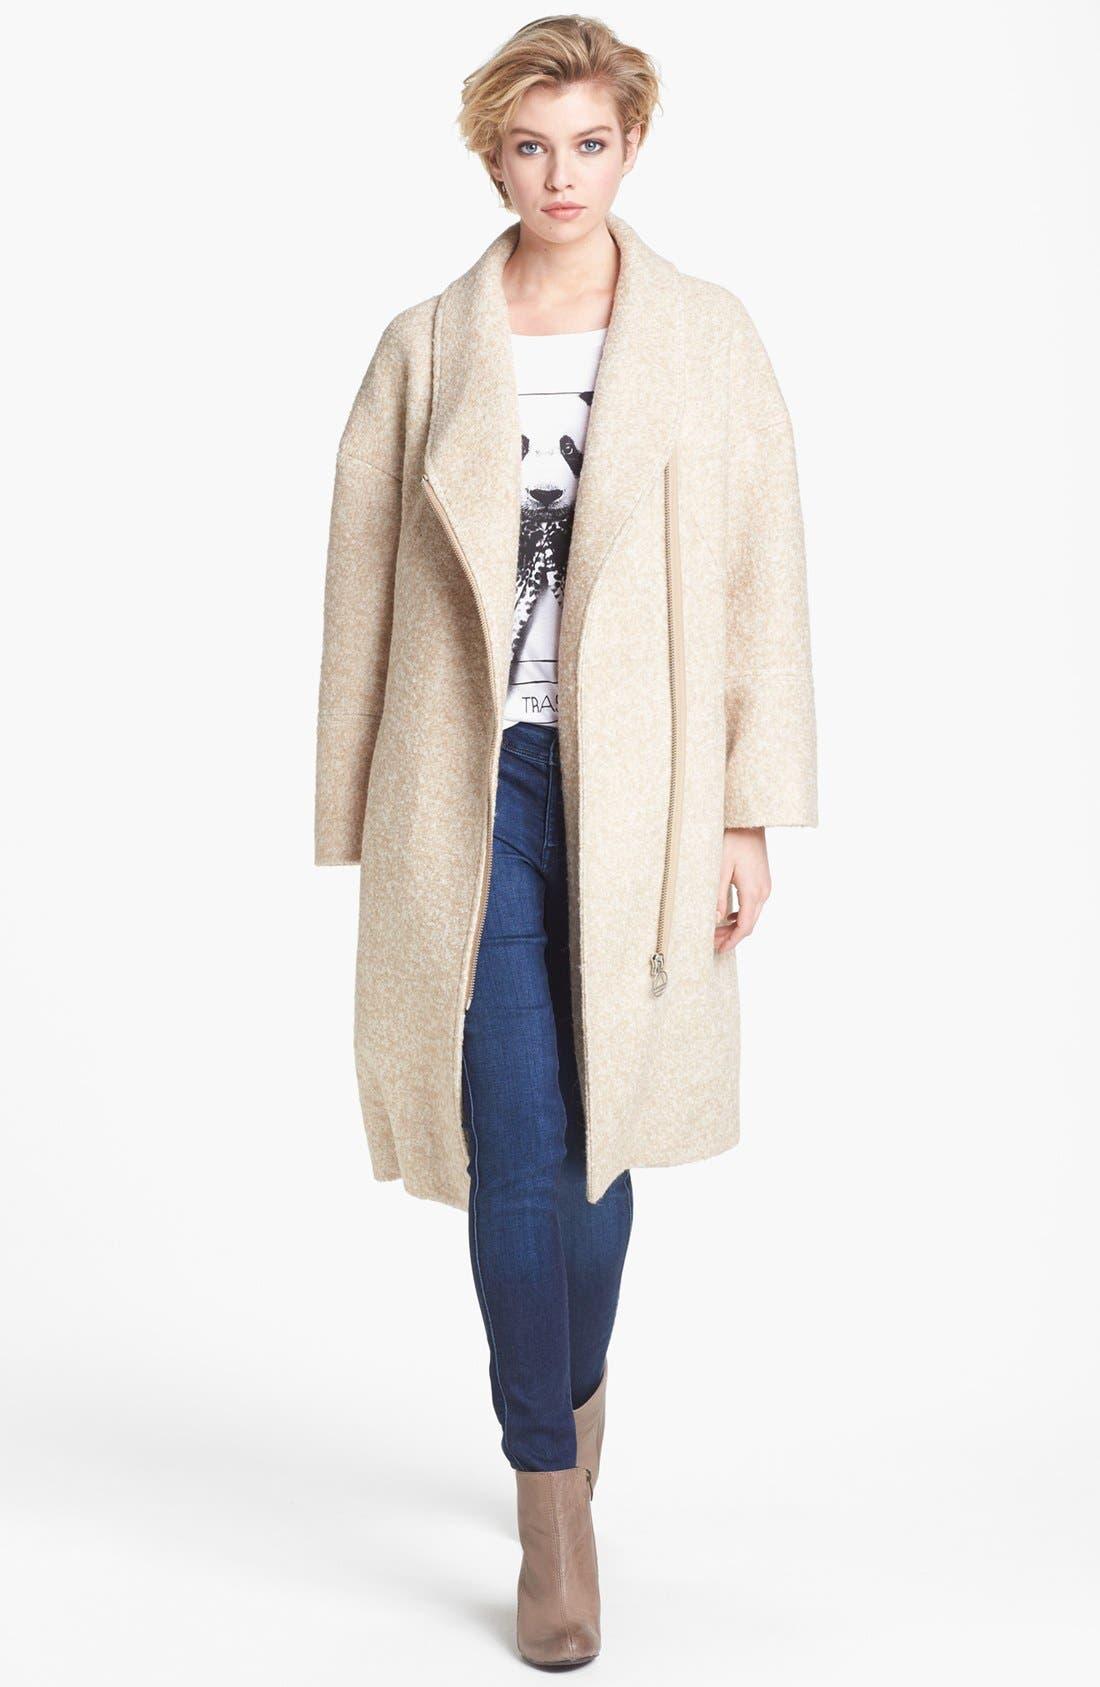 Alternate Image 1 Selected - ELEVENPARIS 'Taylor' Oversized Jacket